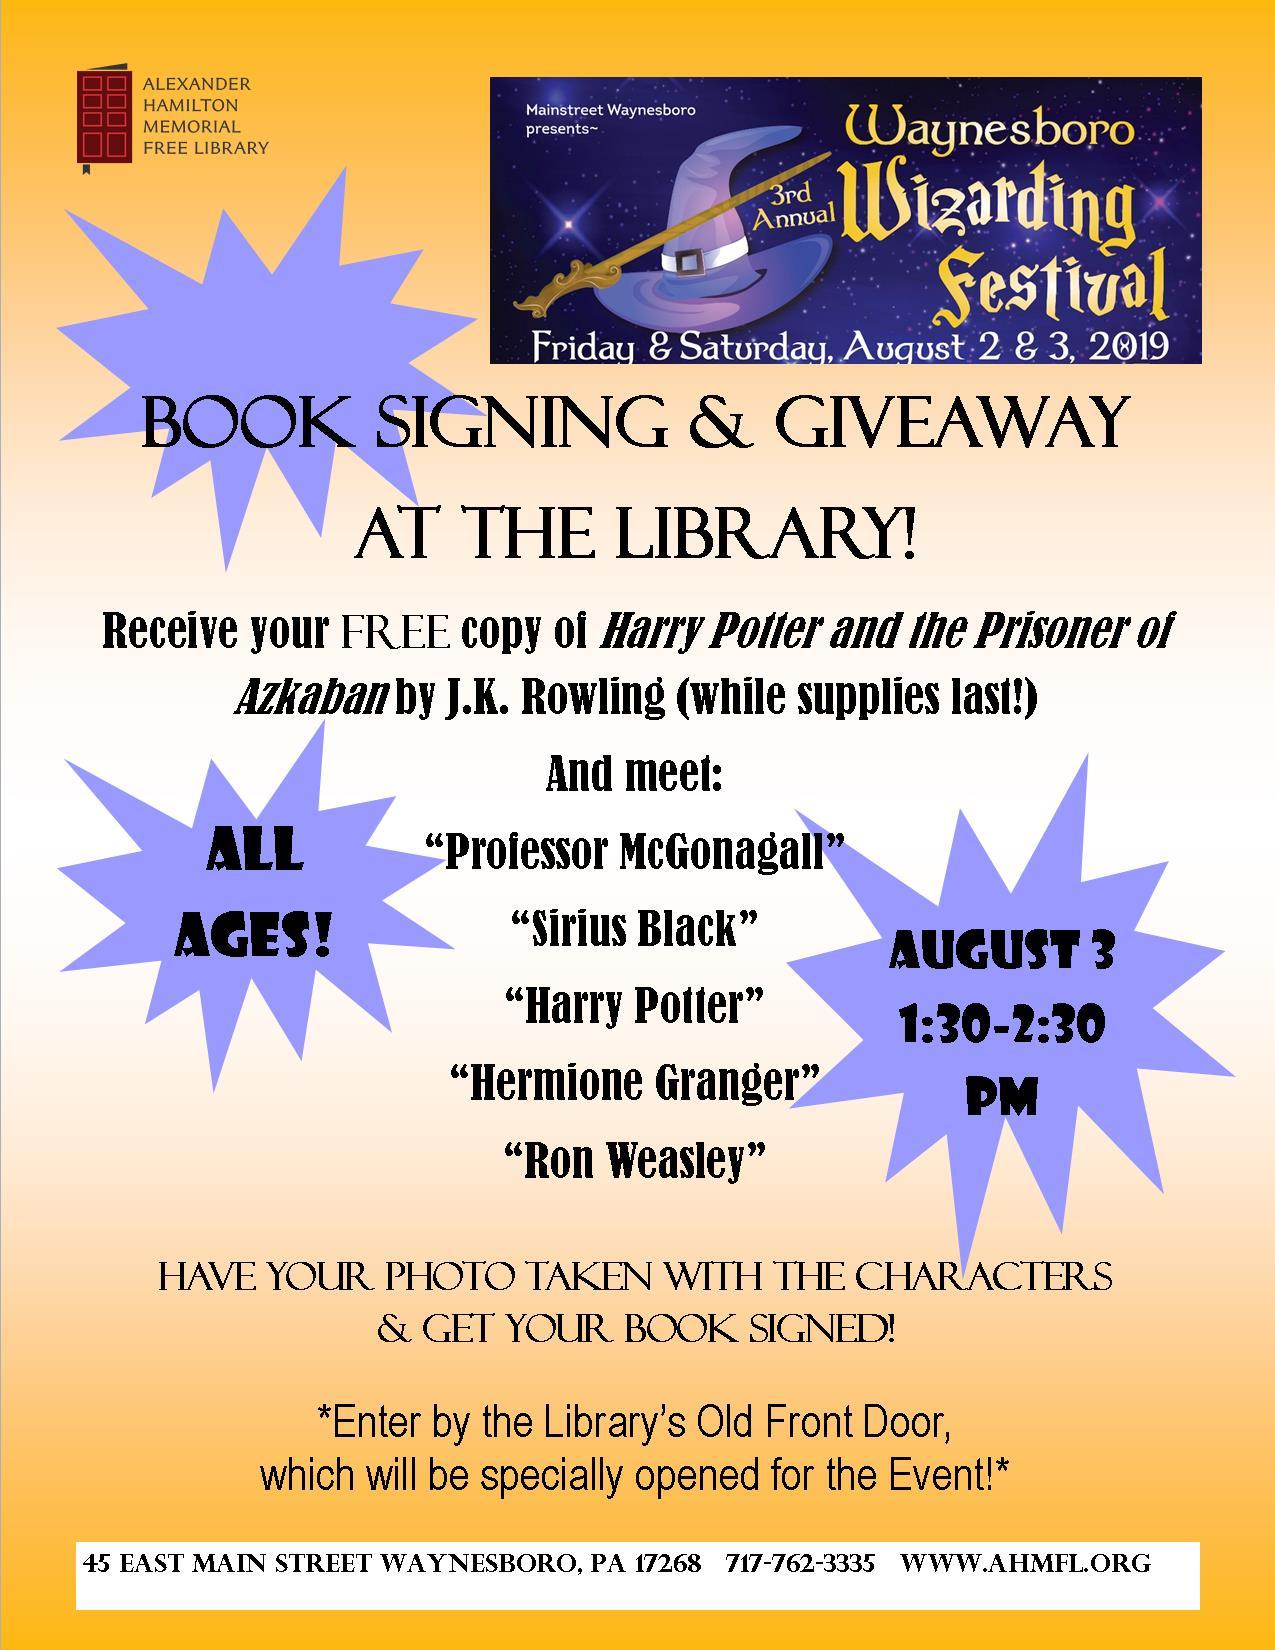 Book Signing & Giveaway flyer.jpg